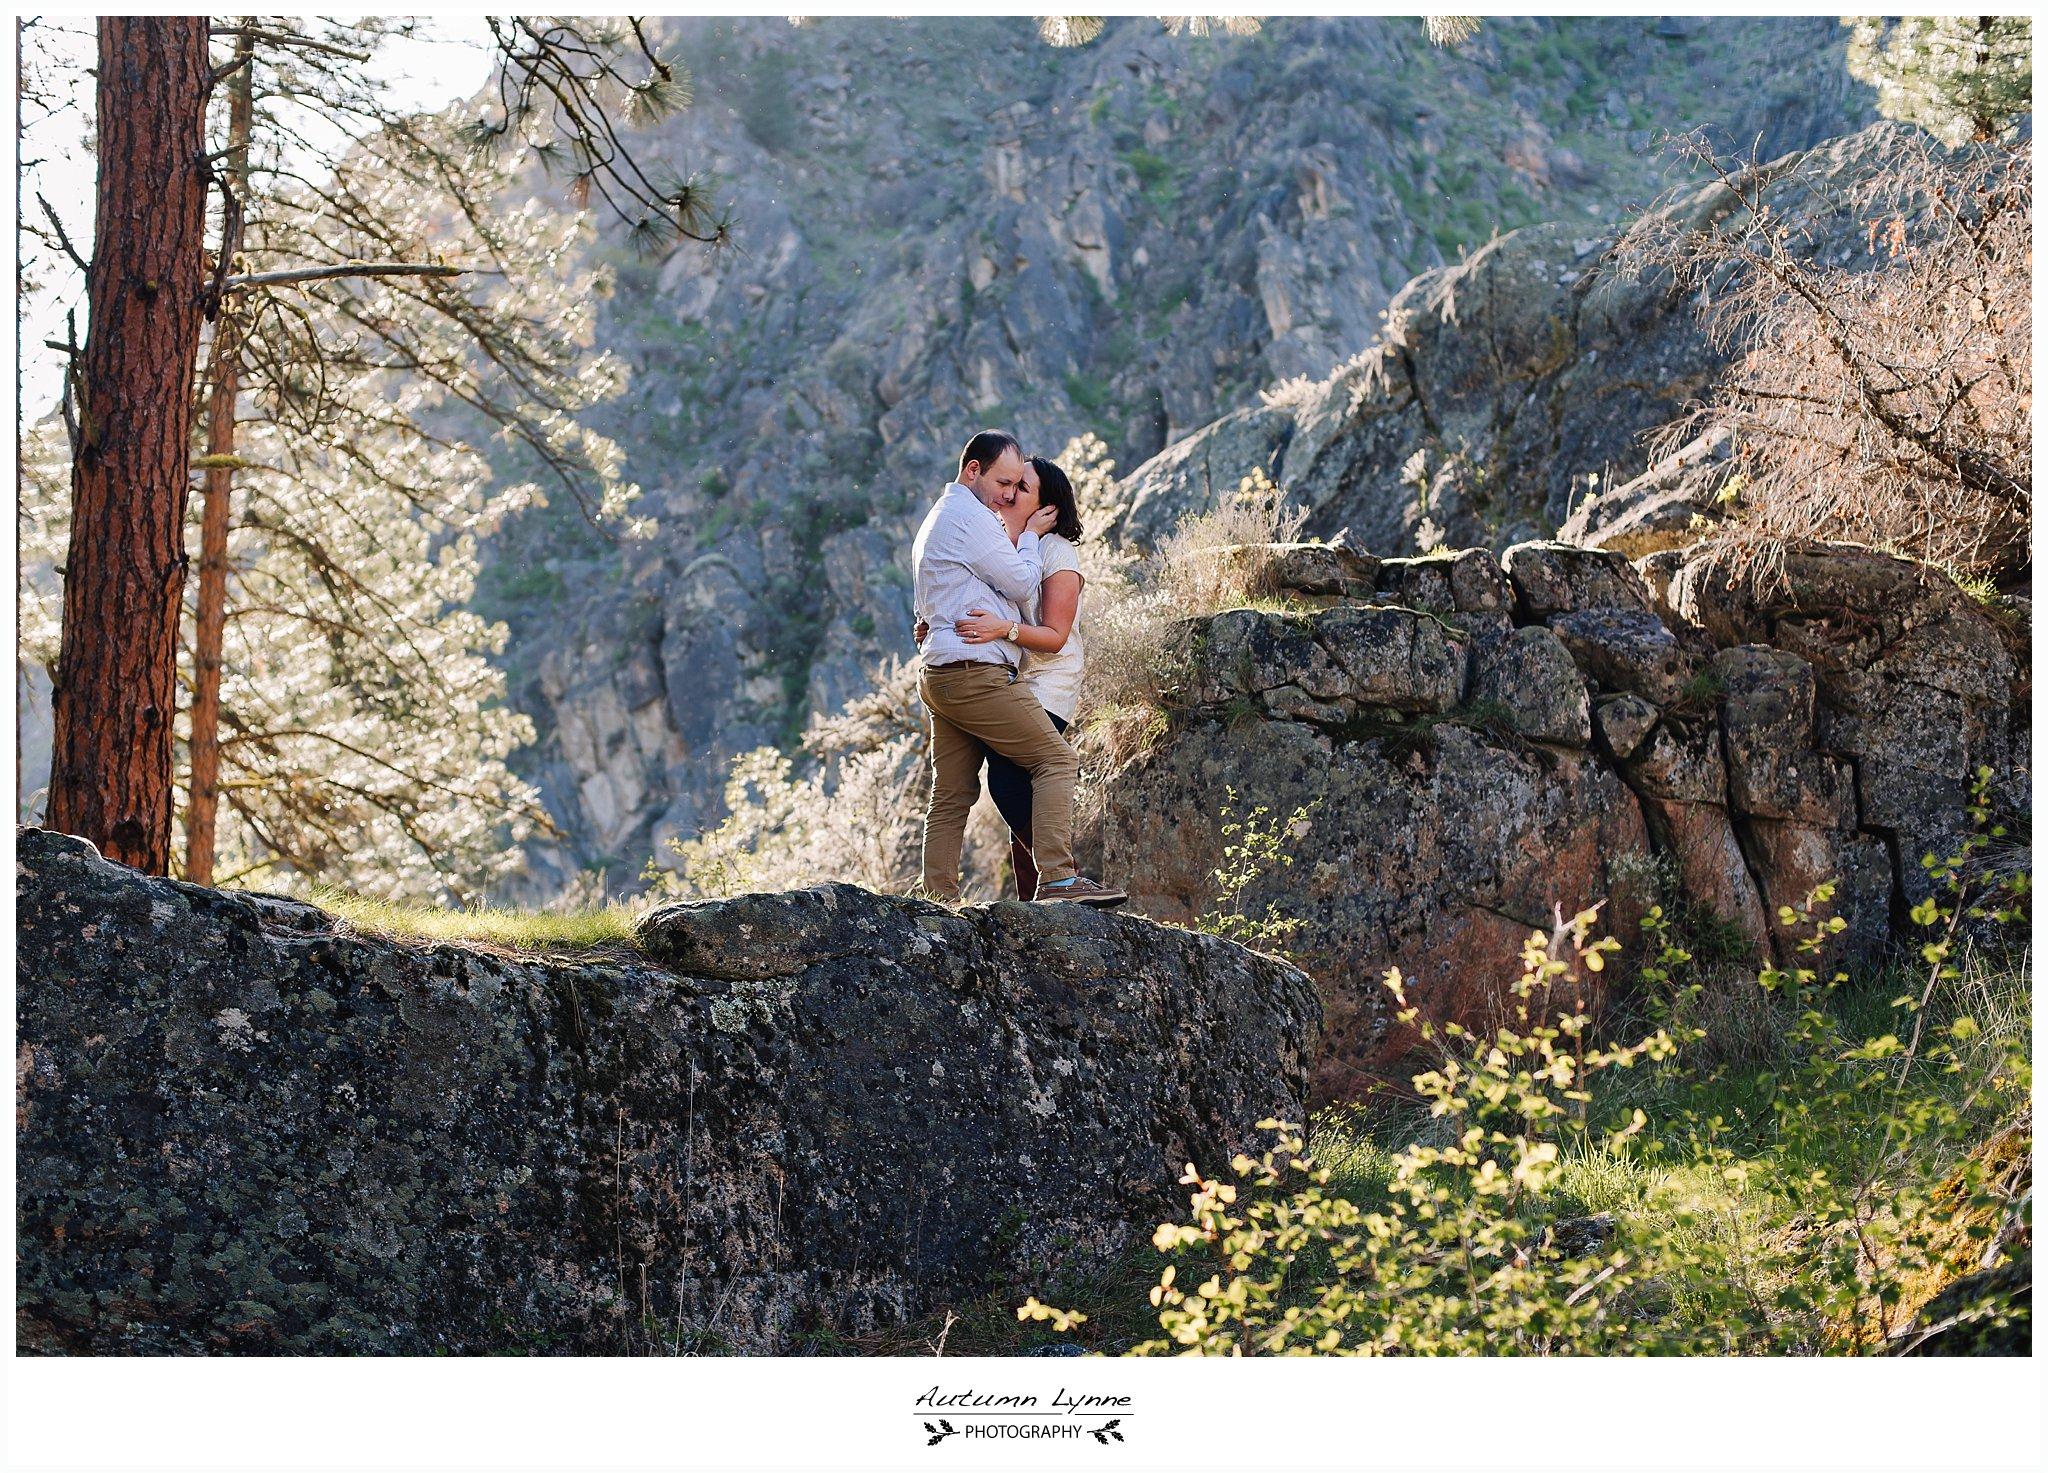 Idaho-adventure-engagement-session-couple-on-rock.jpg